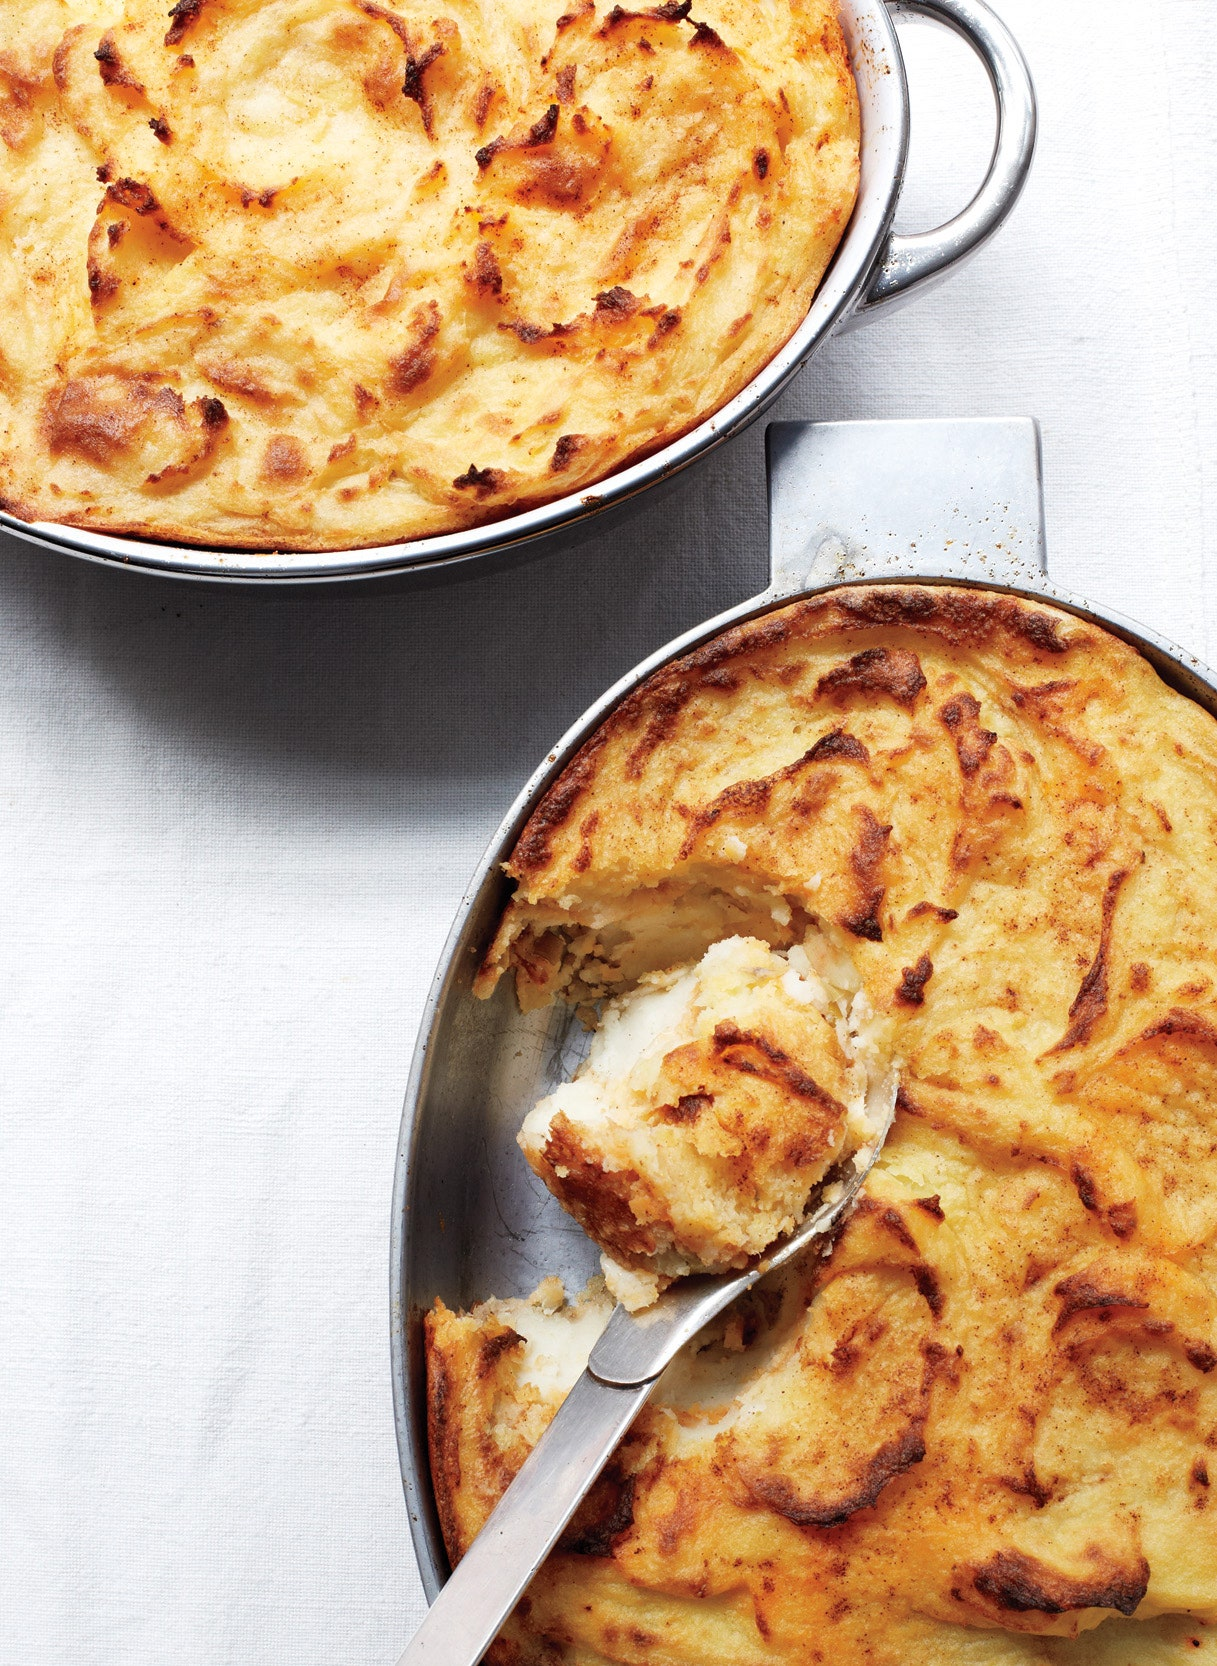 Chili Pot Pie with Polenta Crust foto